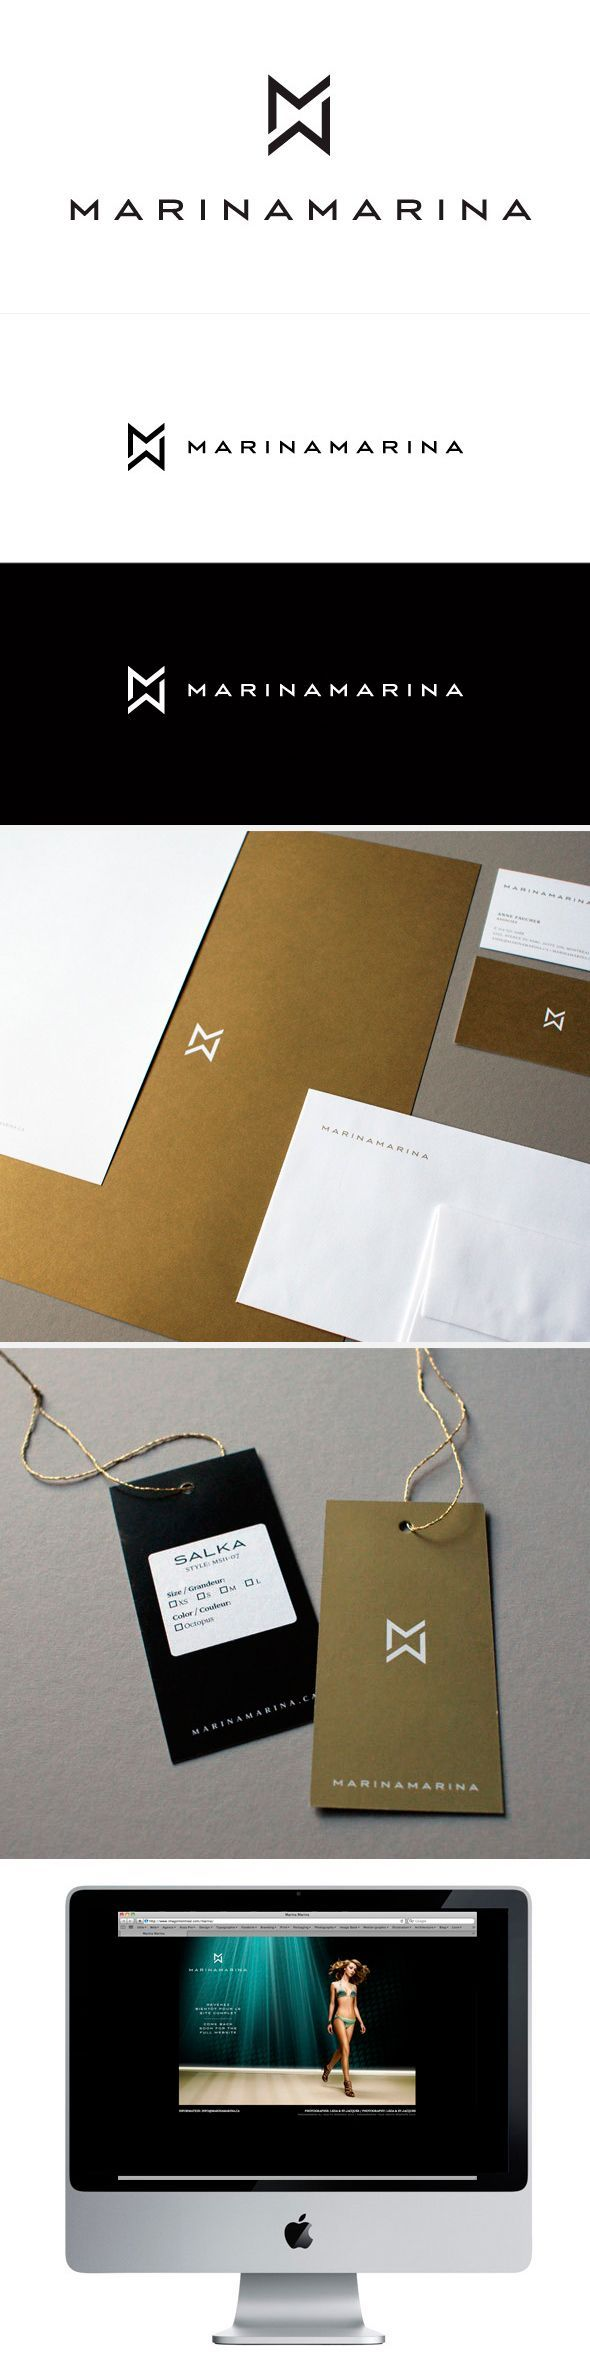 visual ID / marinamarina #branding #identity #design Uploaded by user